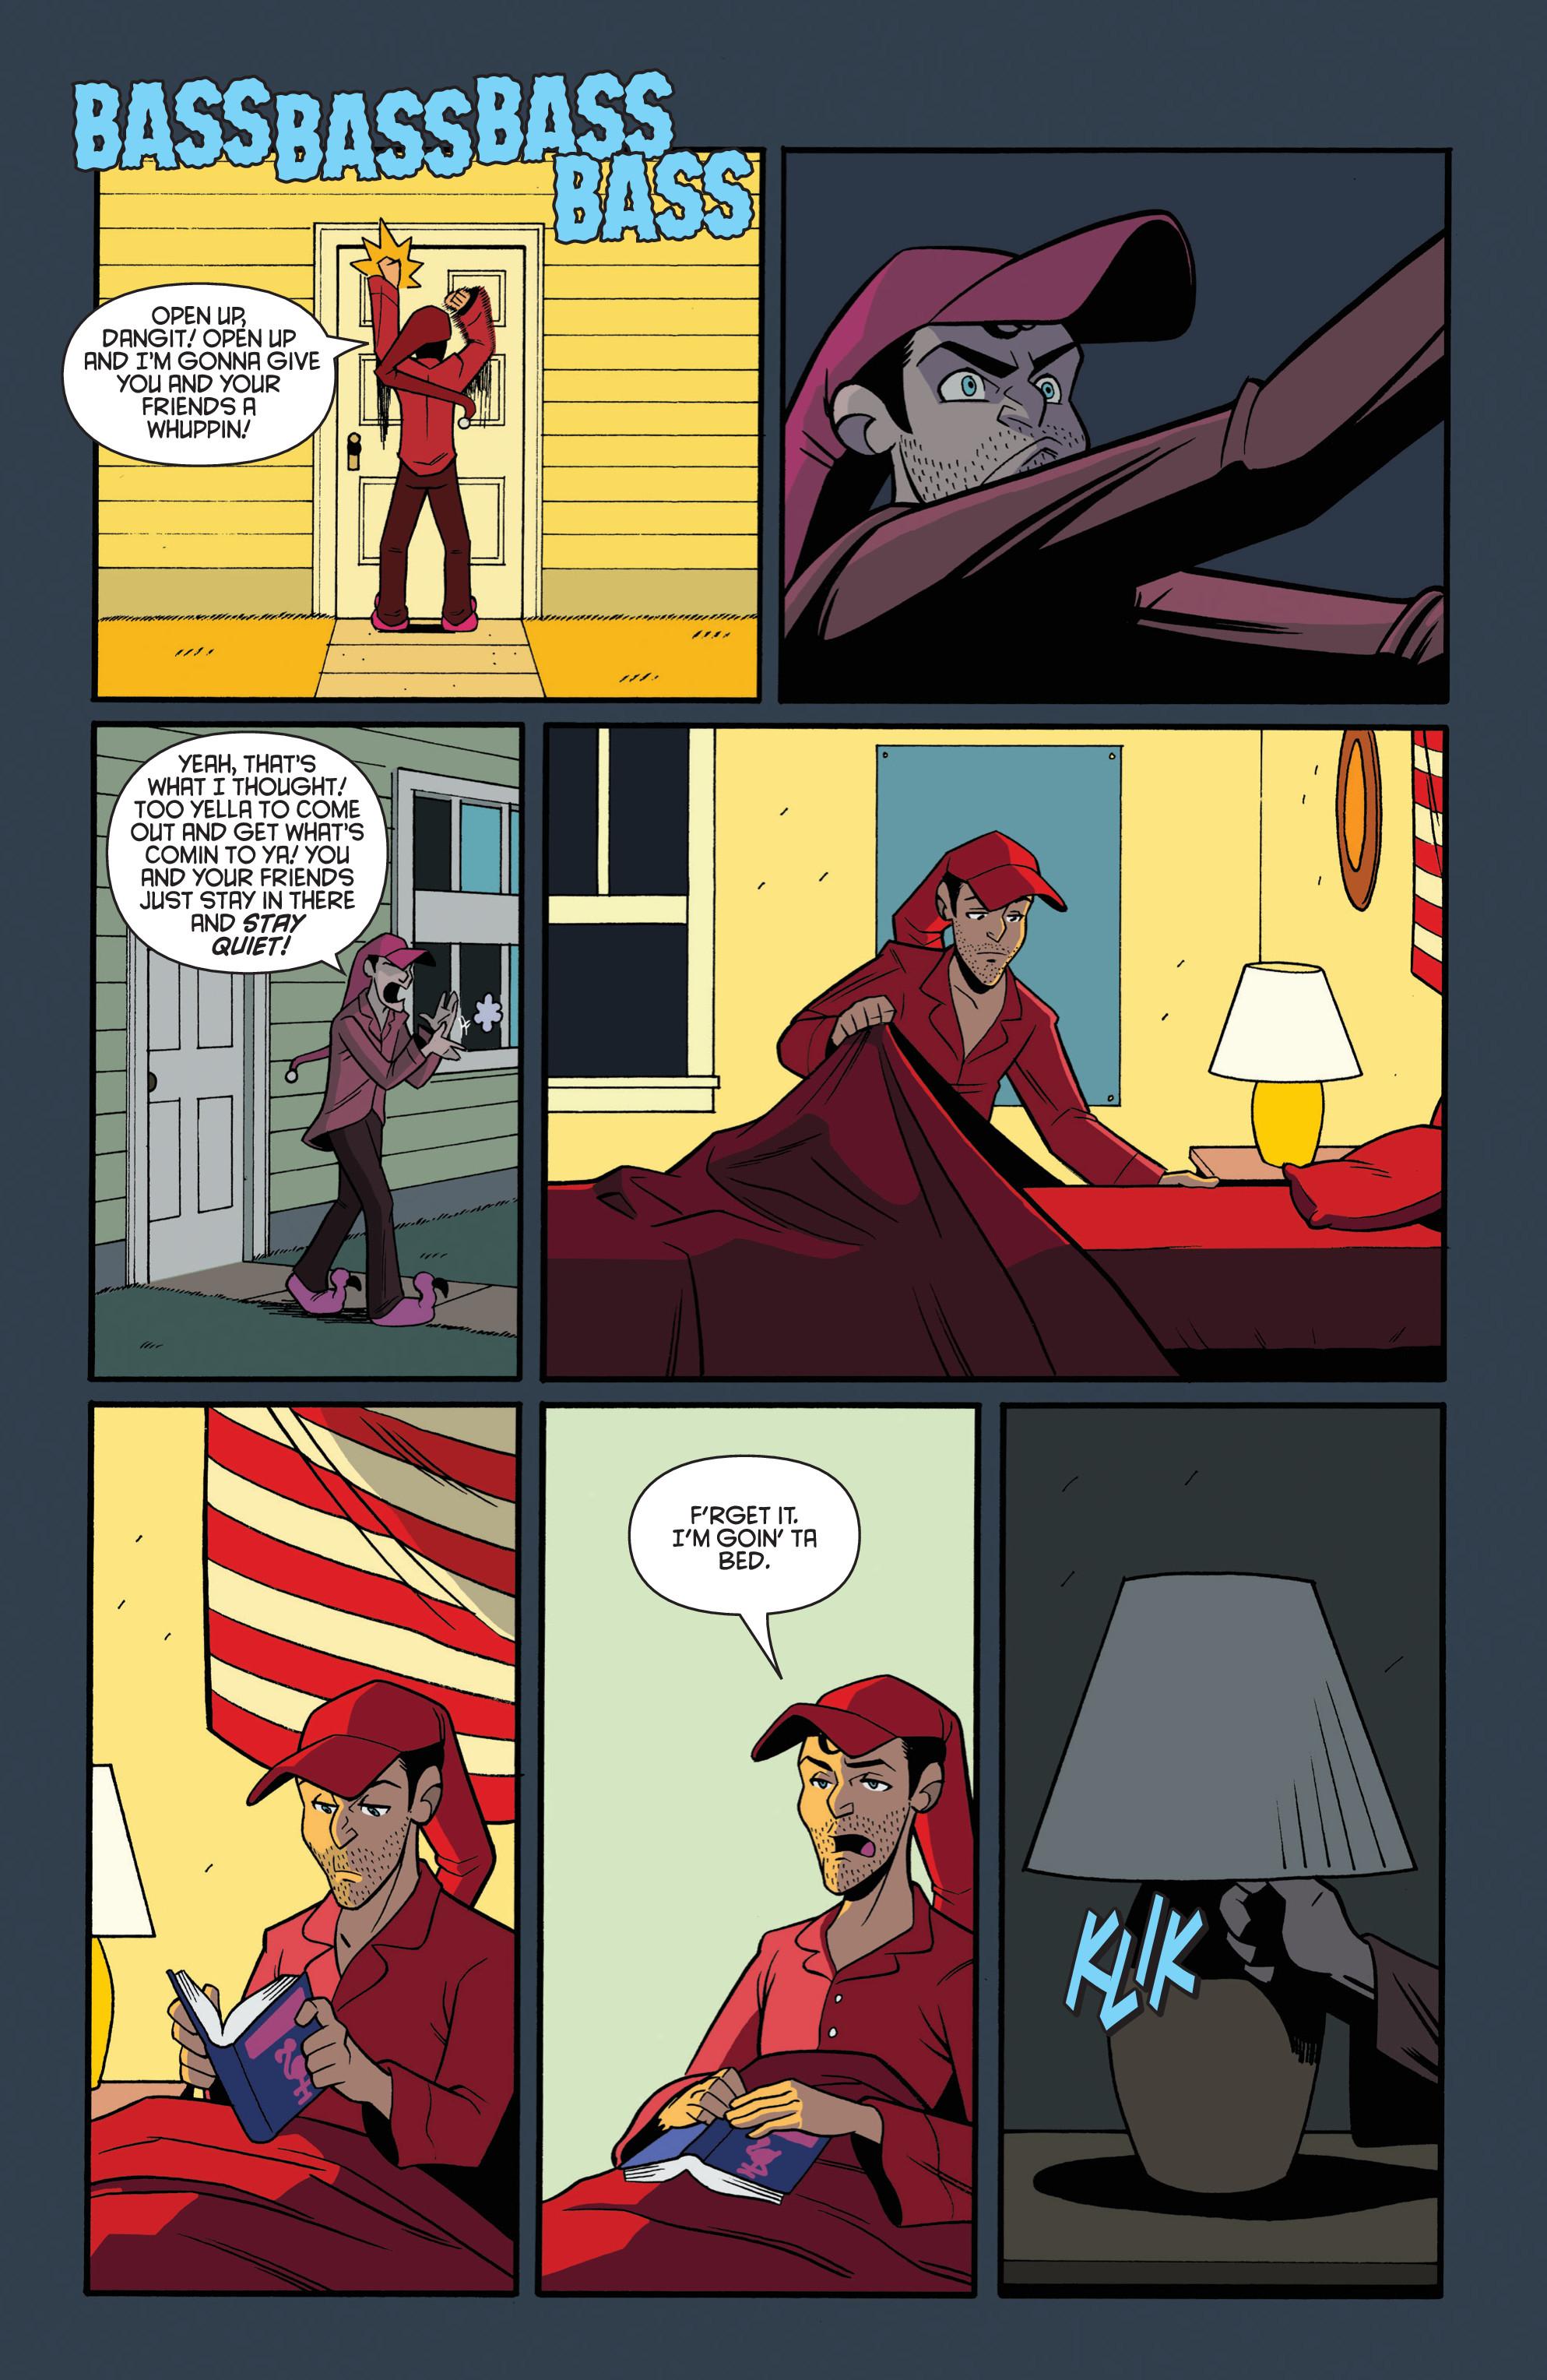 Read online Smosh comic -  Issue #5 - 29